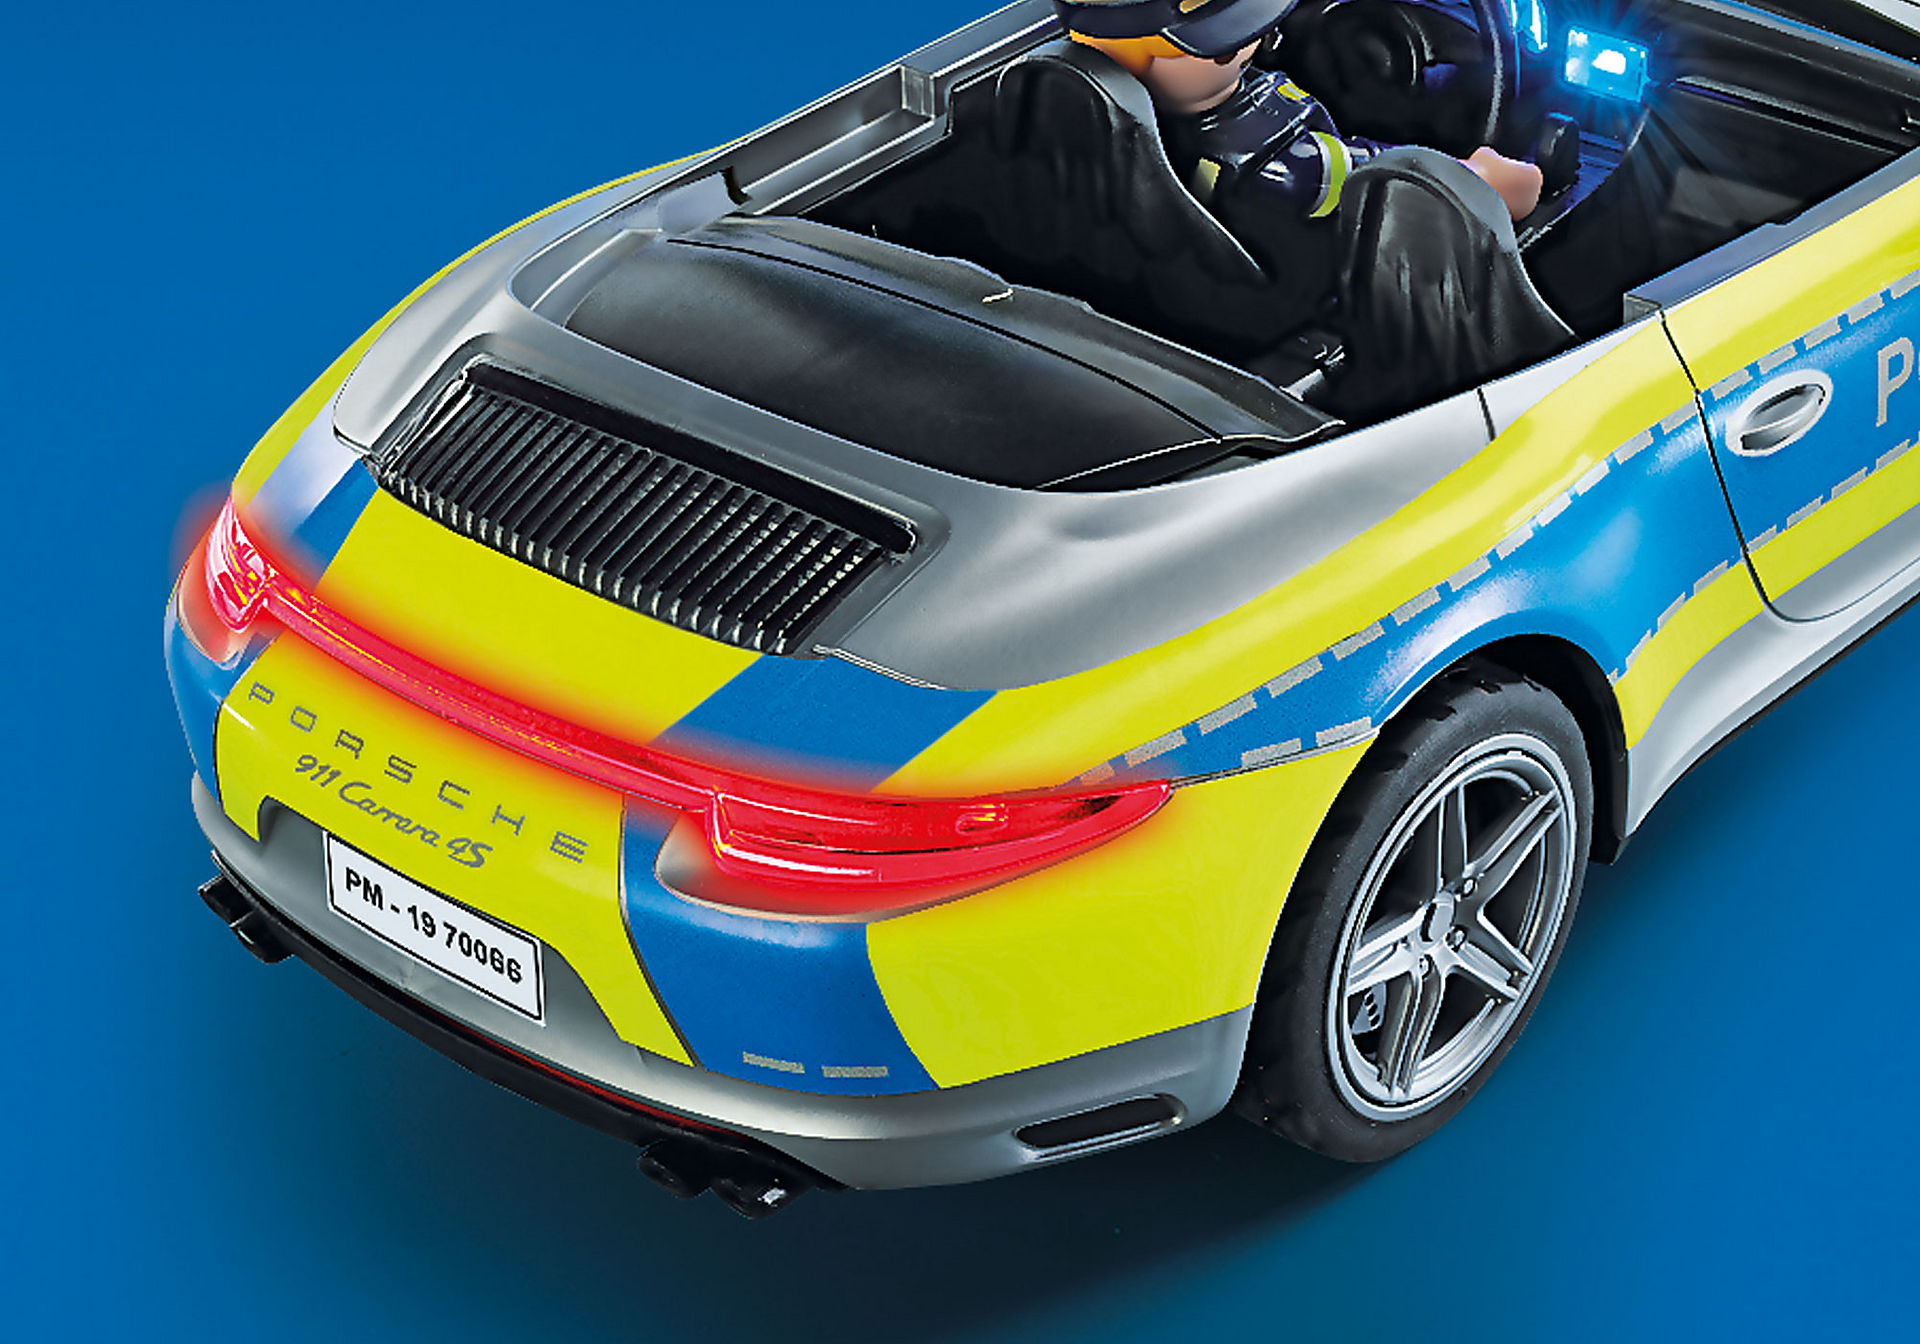 70066 Porsche 911 Carrera 4S Αστυνομικό όχημα zoom image6